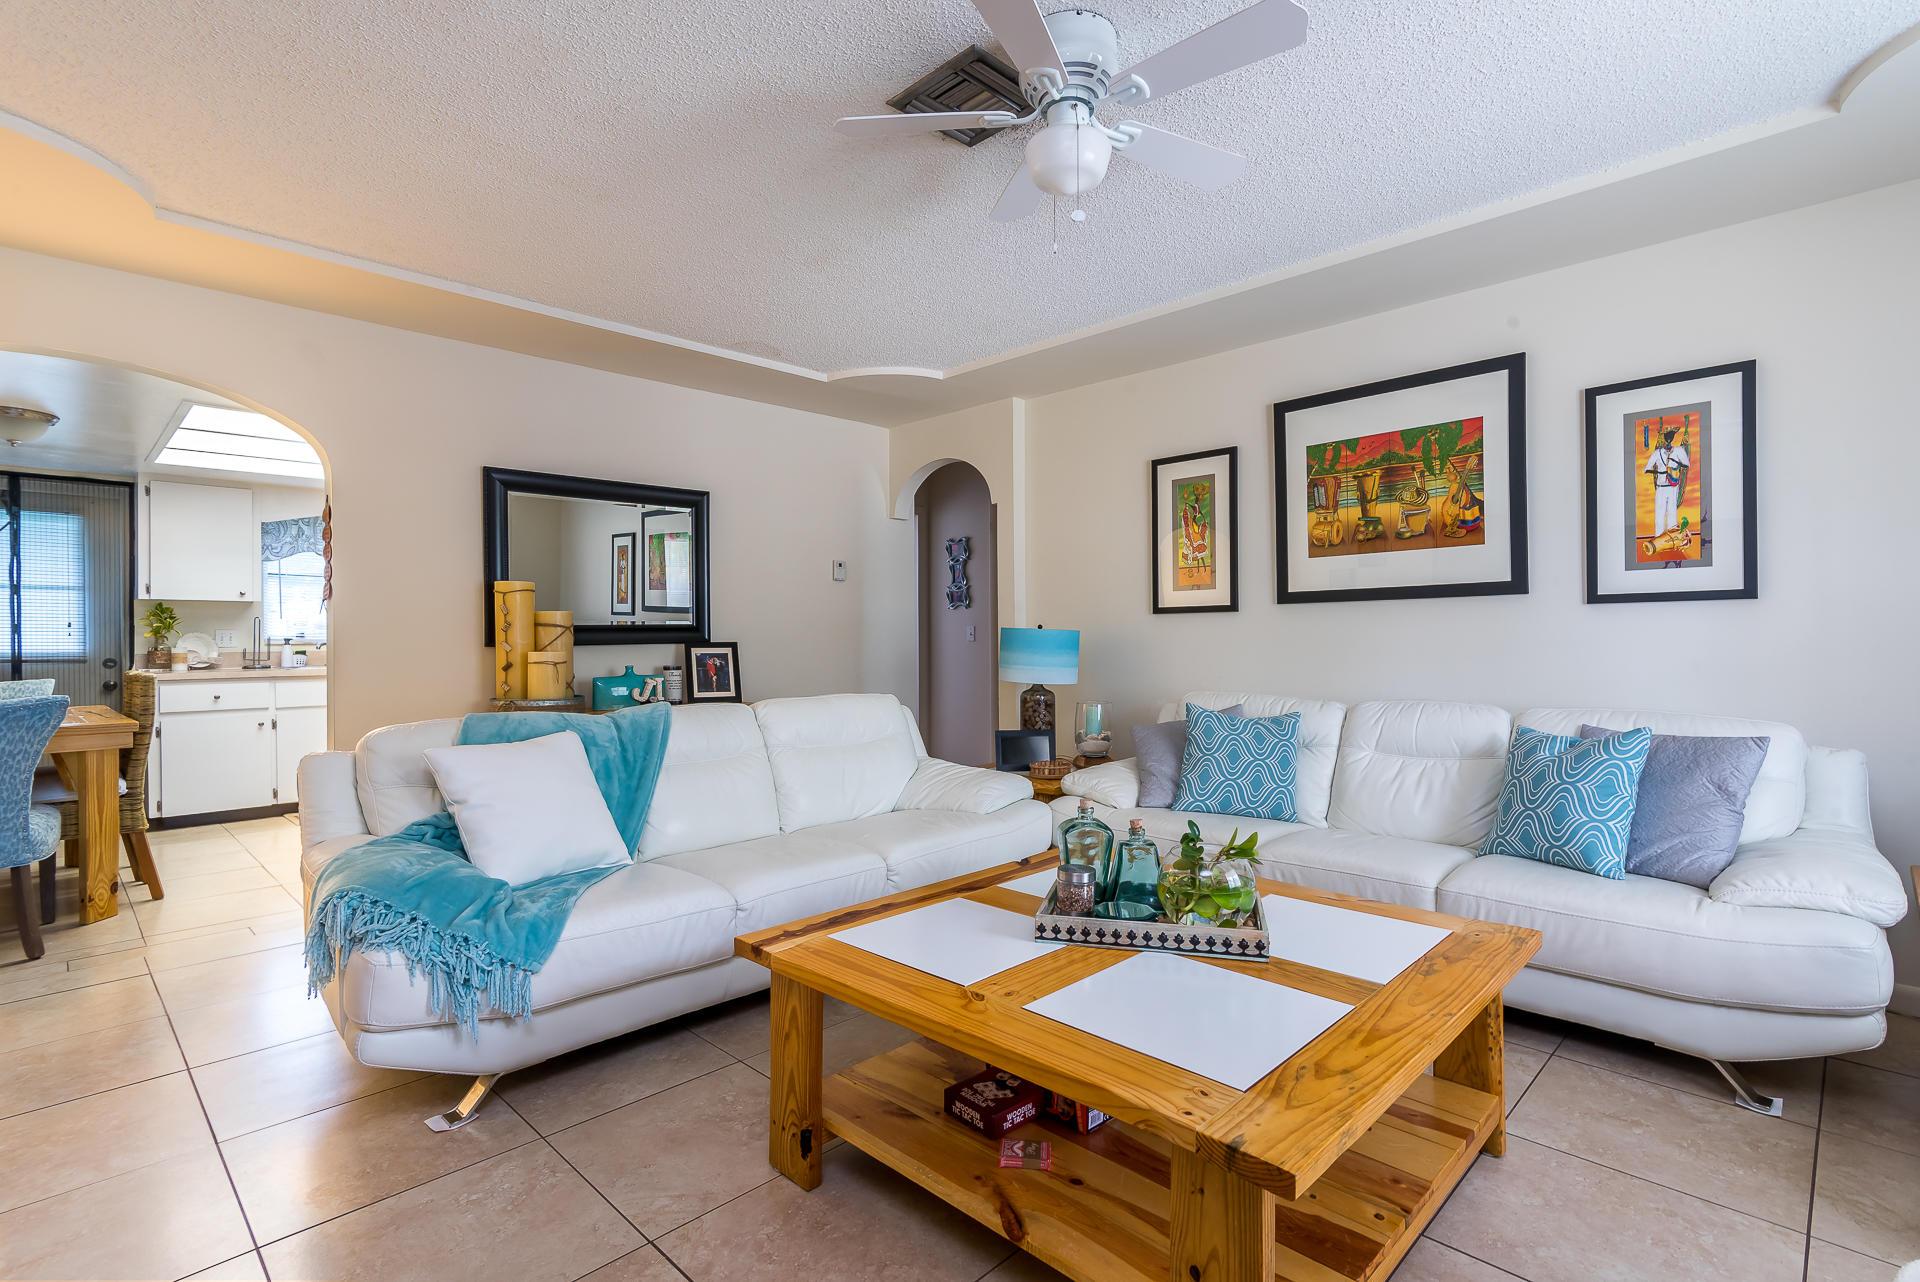 2358-2464 Taylor, West Palm Beach, Florida 33415